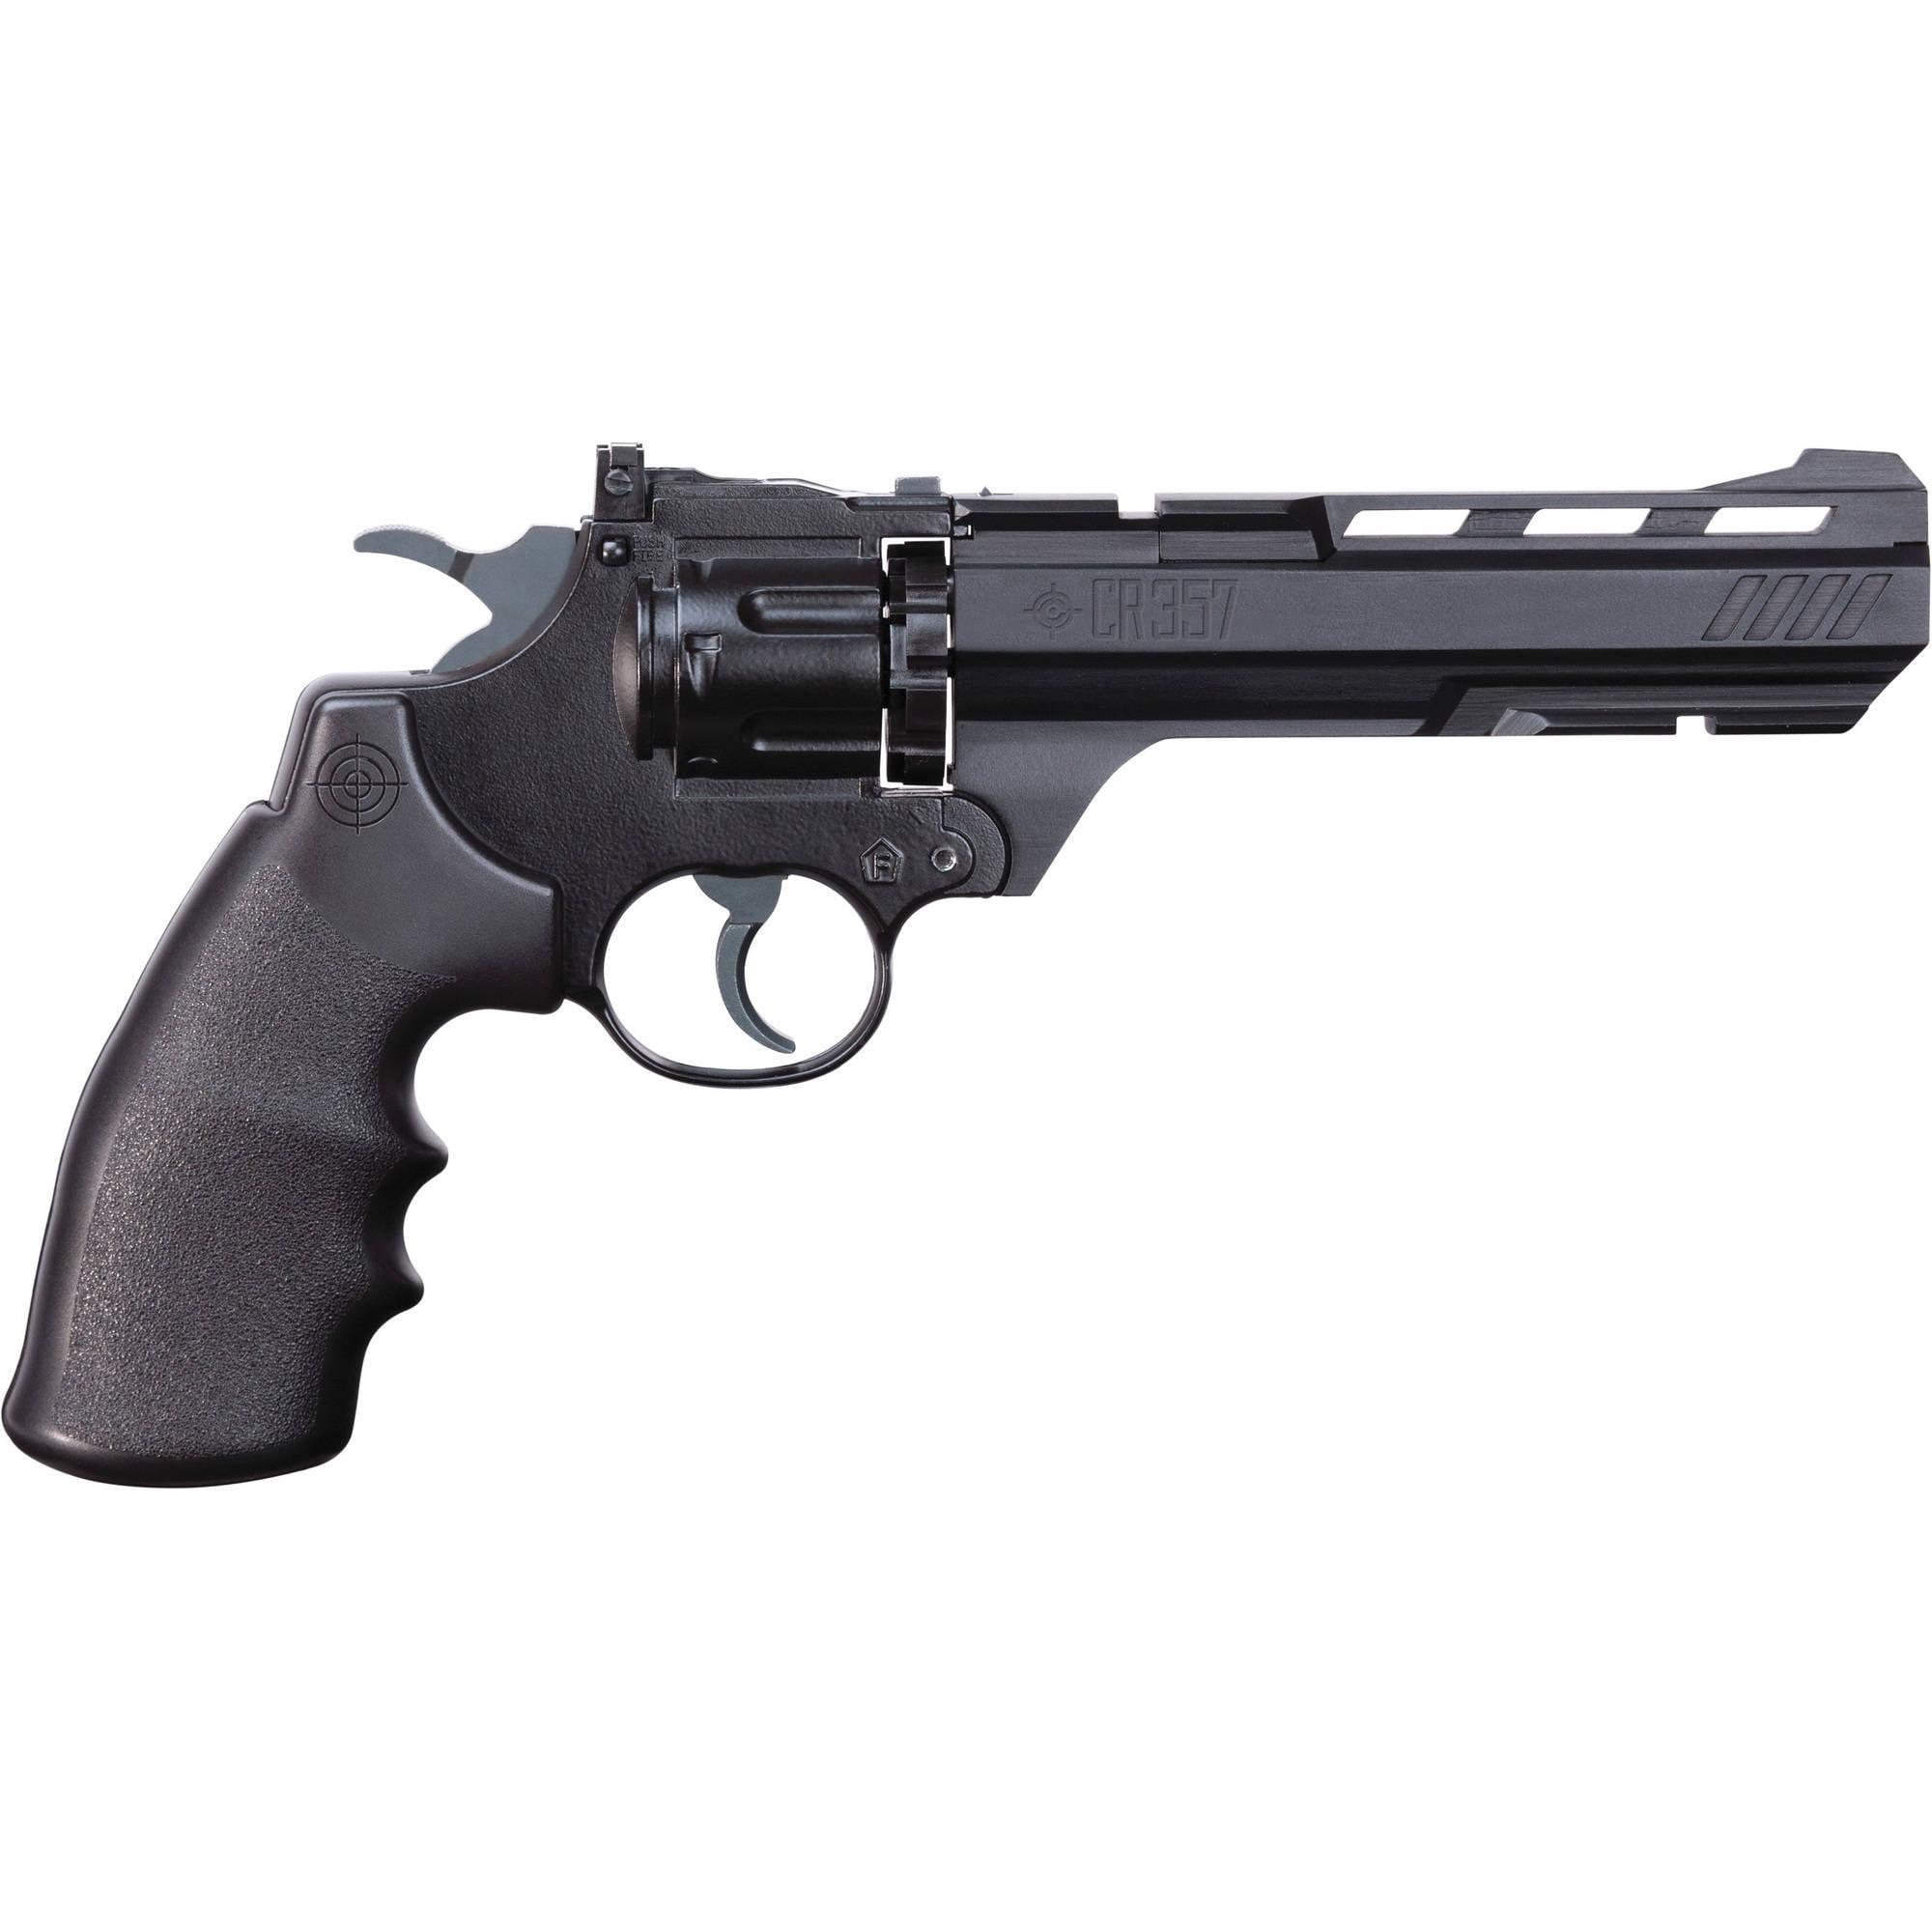 Crosman CR357 Revolver .177 Caliber CO2 Air Pistol, 465fps by Crosman